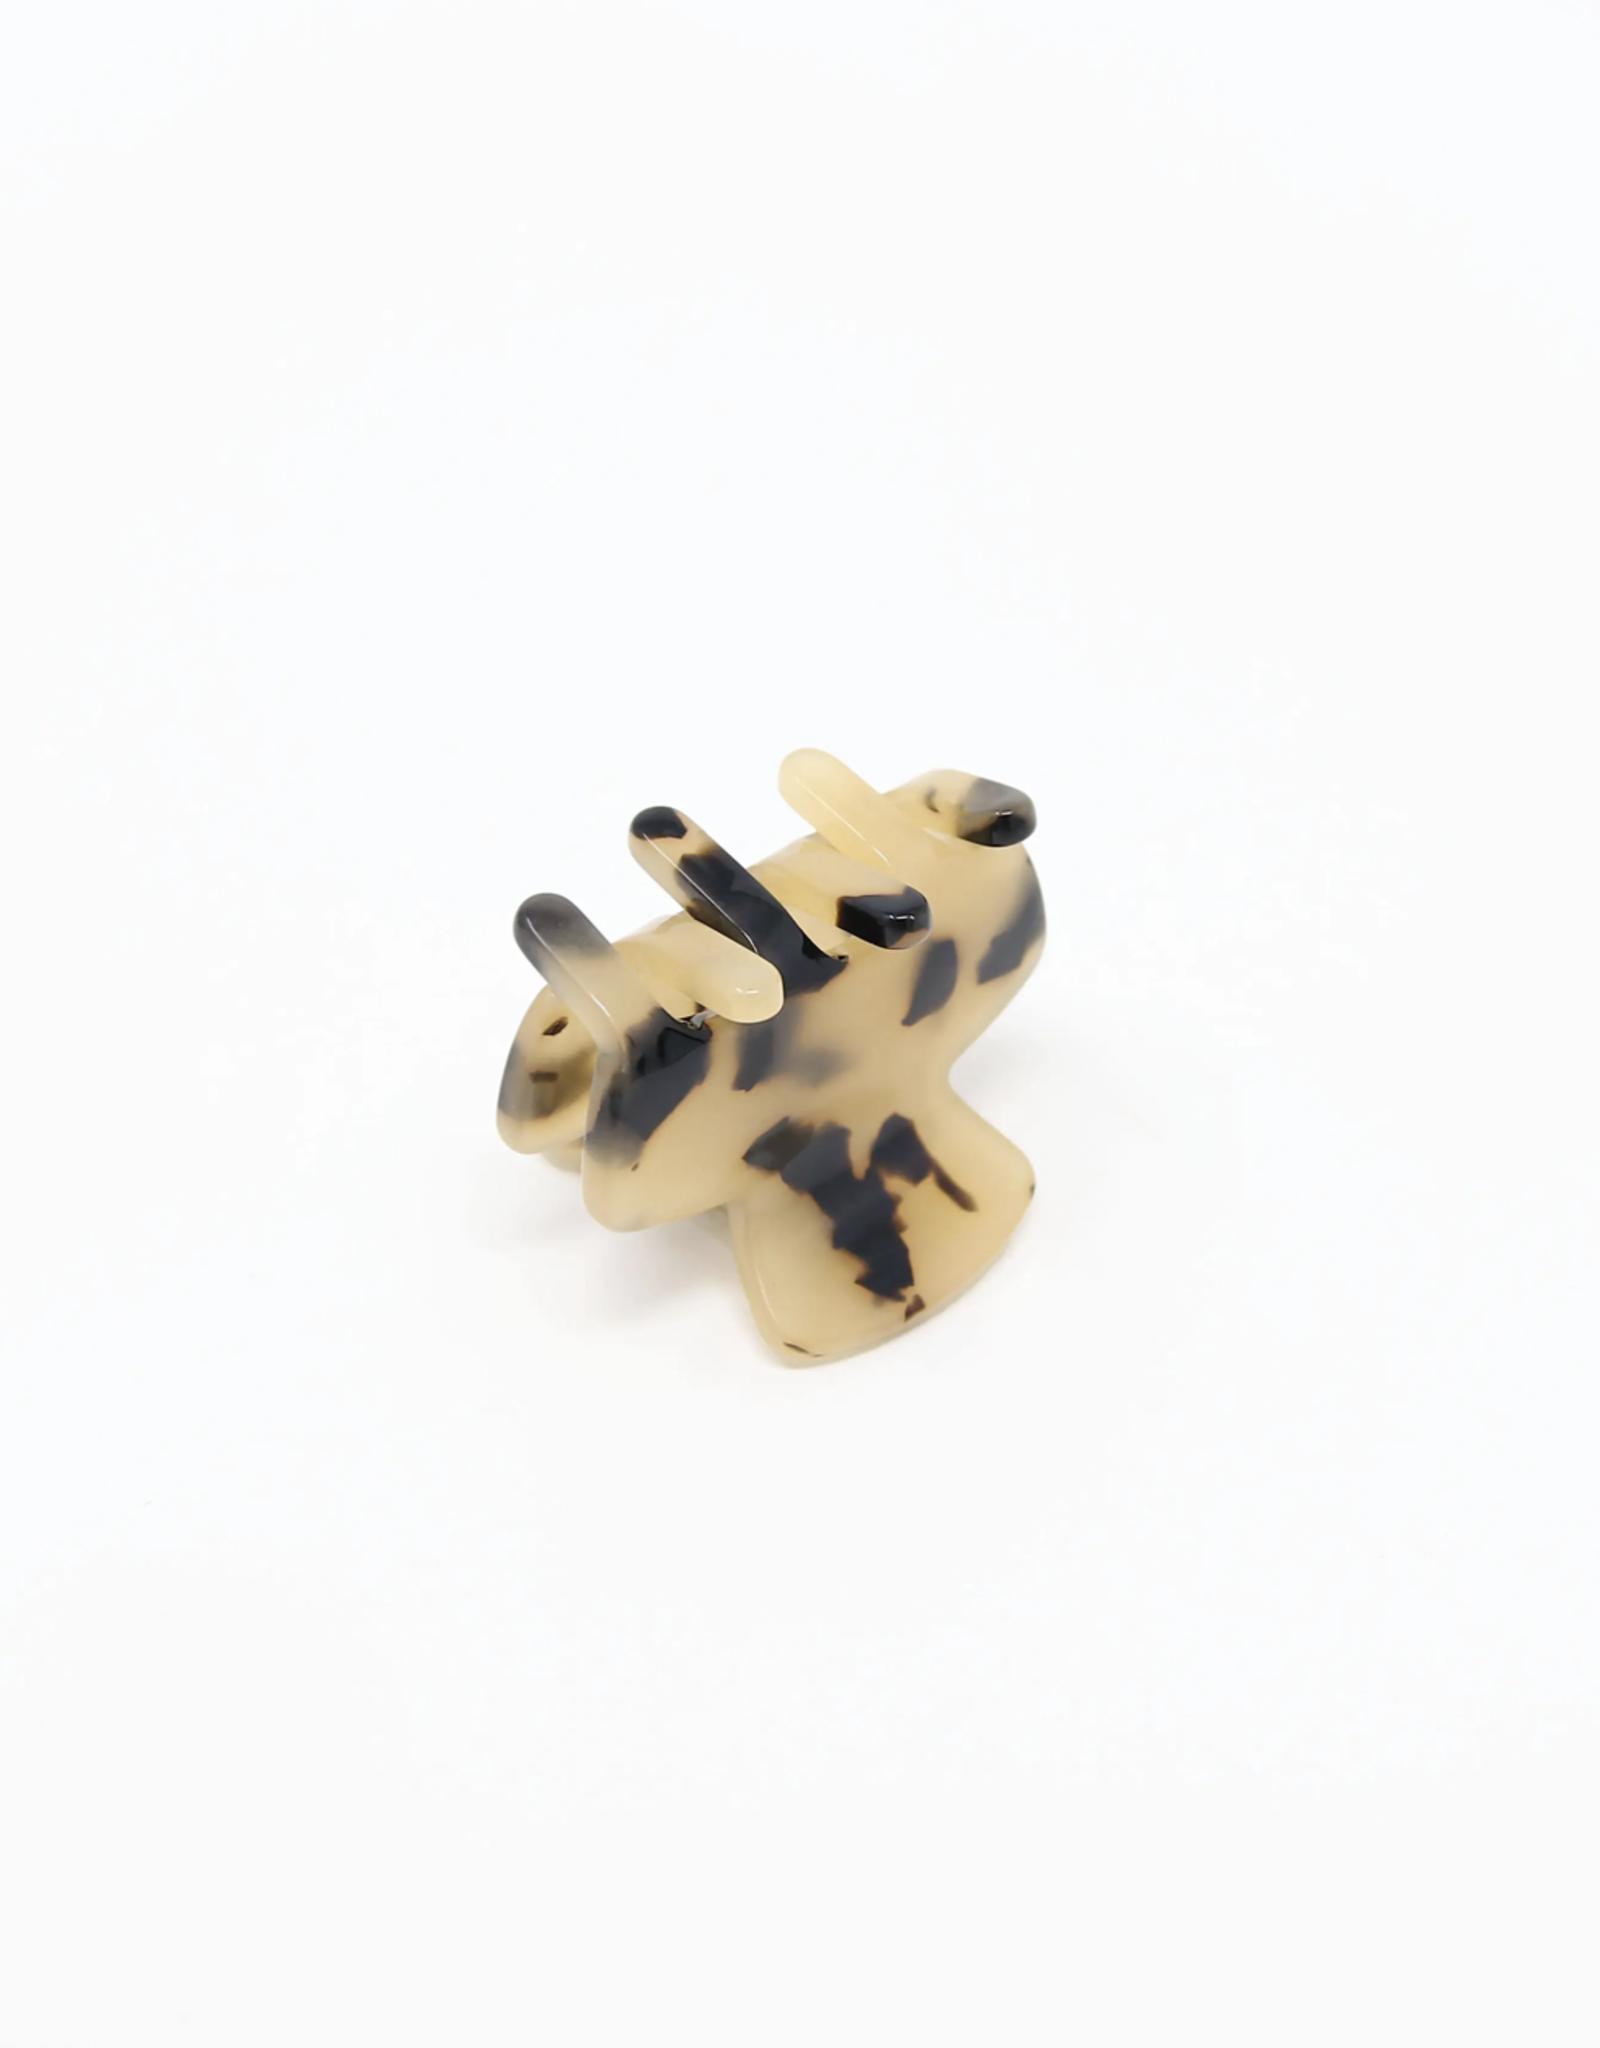 Tiny Acetate Claw